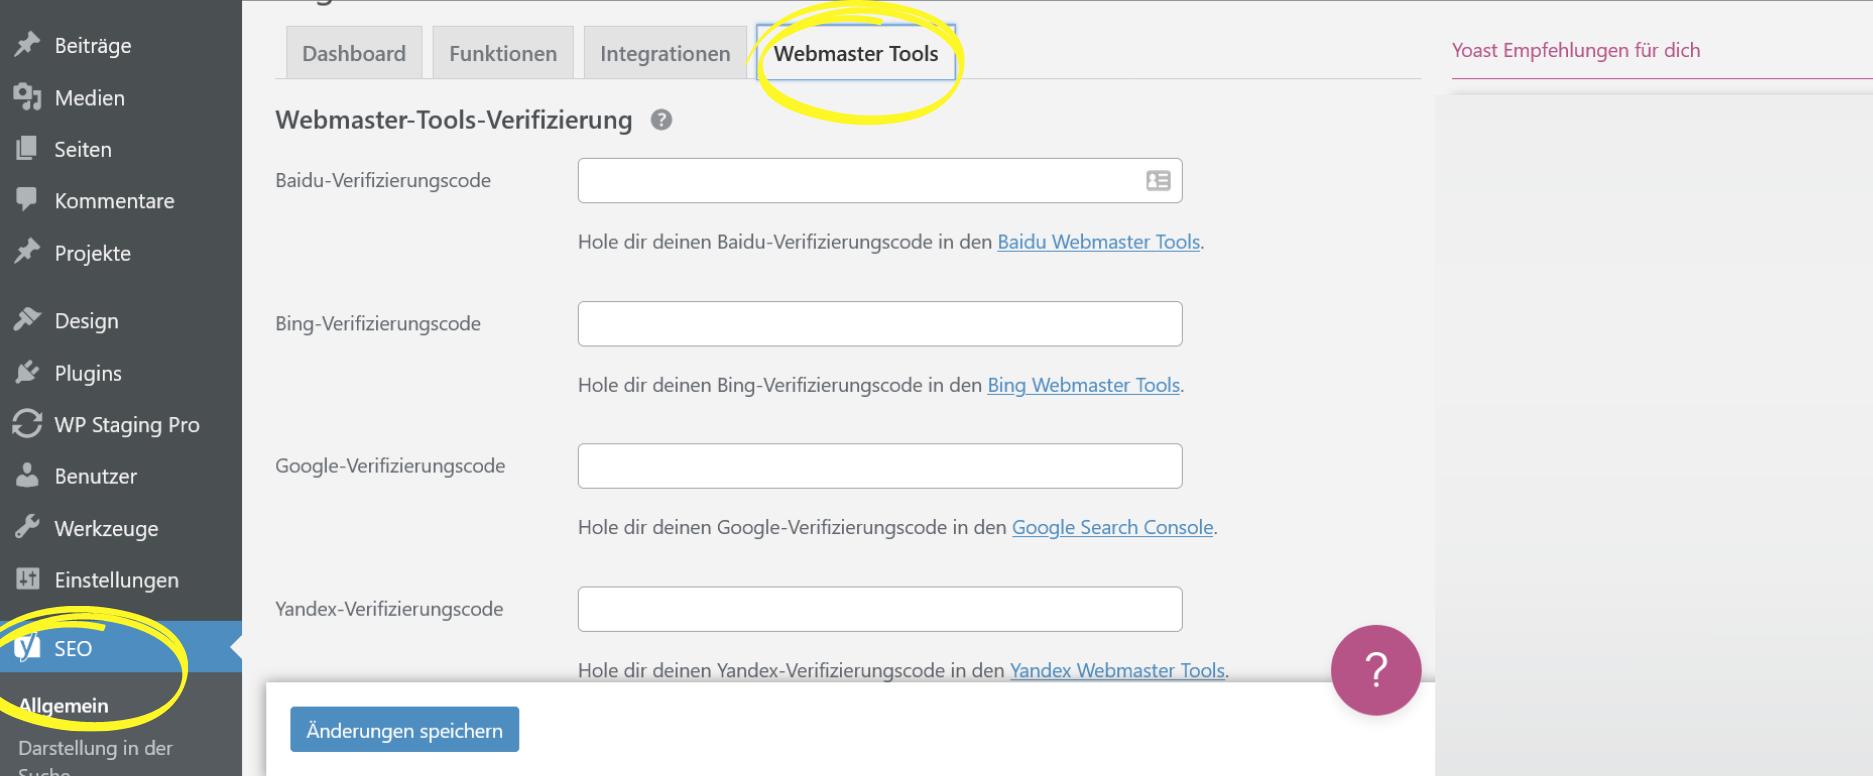 Webmaster IDs in Yoast SEO hinterlegen